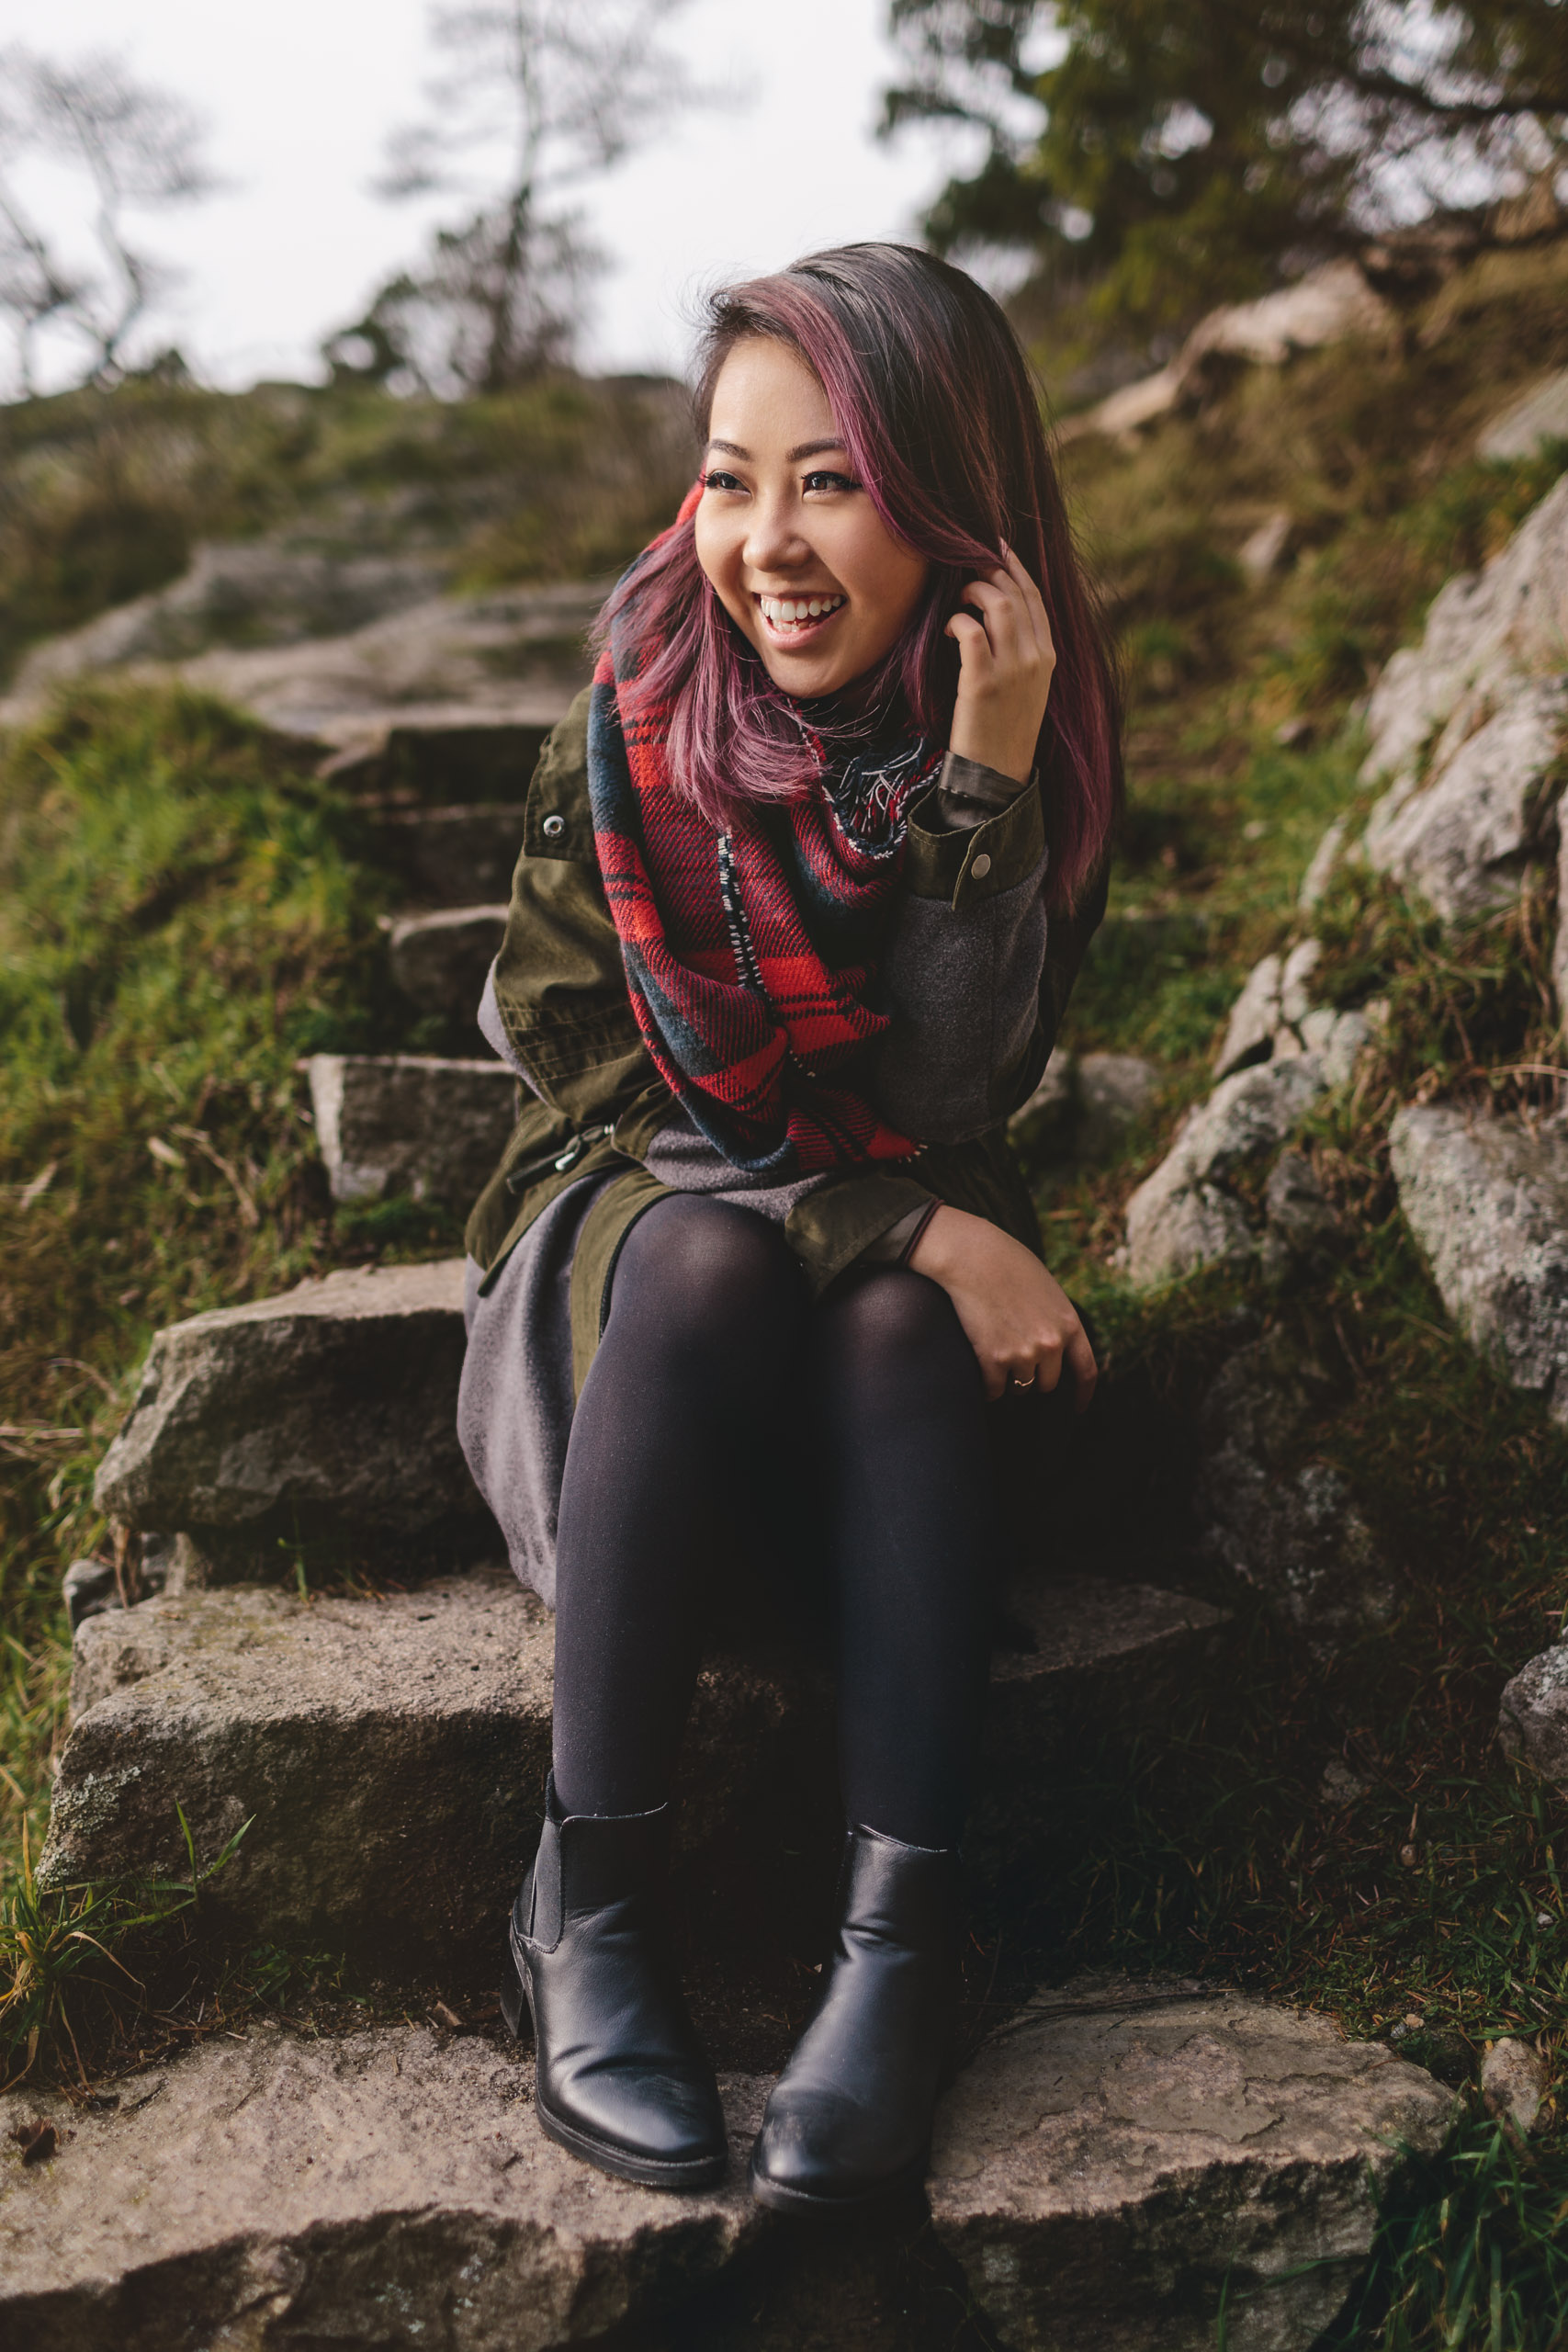 vancouver portrait photographer whytecliff park with Tien Nguyen